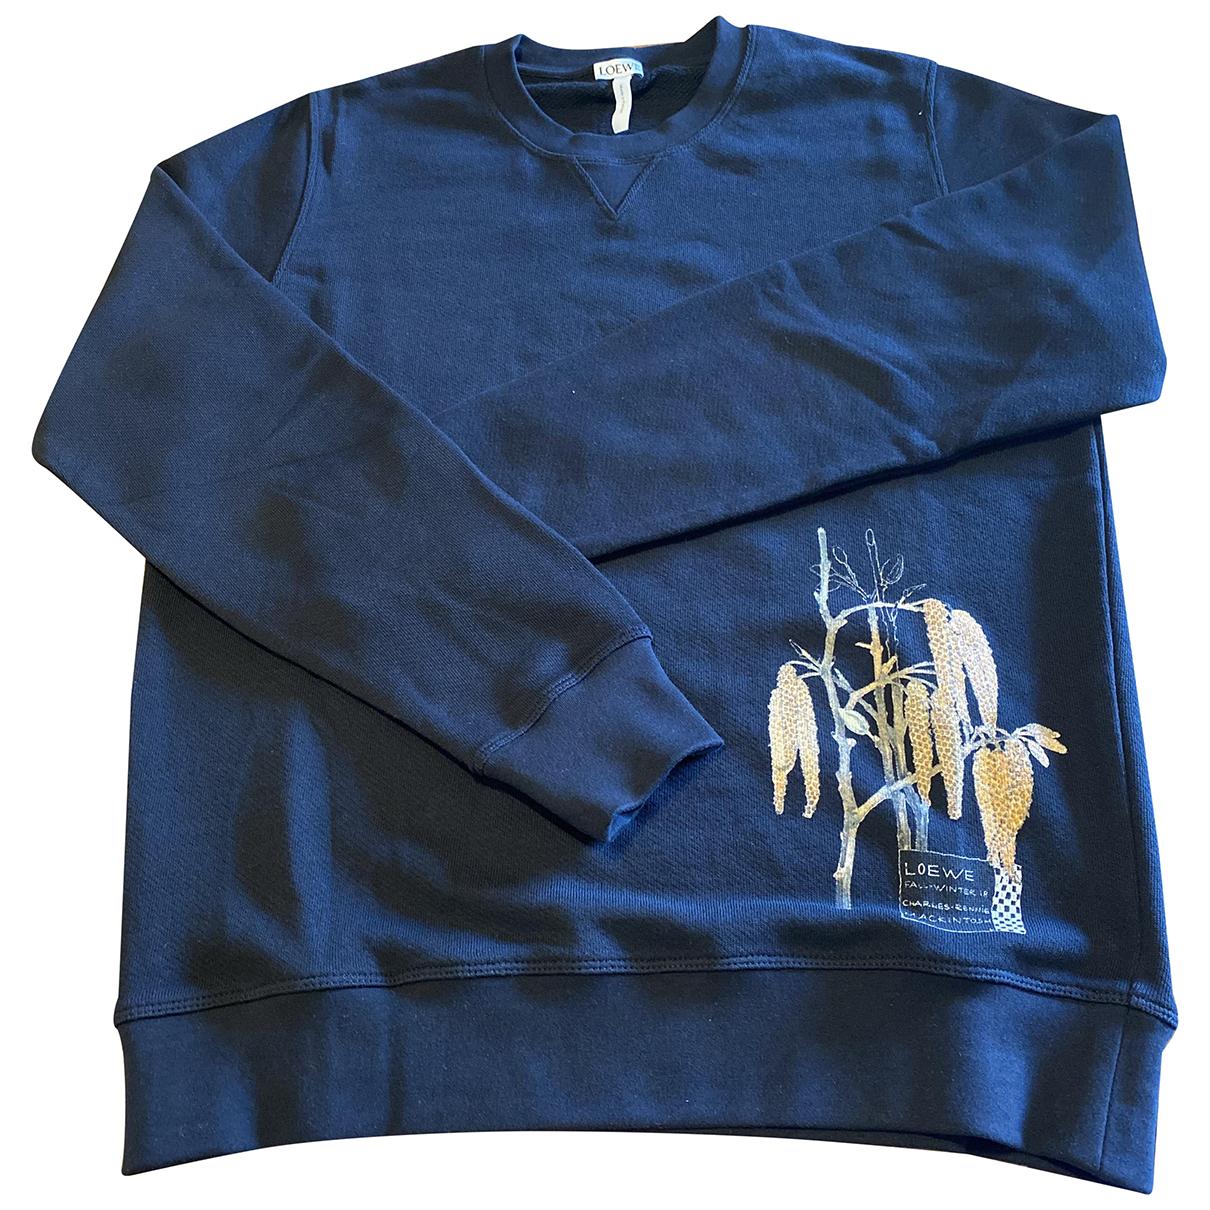 Loewe N Black Cotton Knitwear & Sweatshirts for Men S International